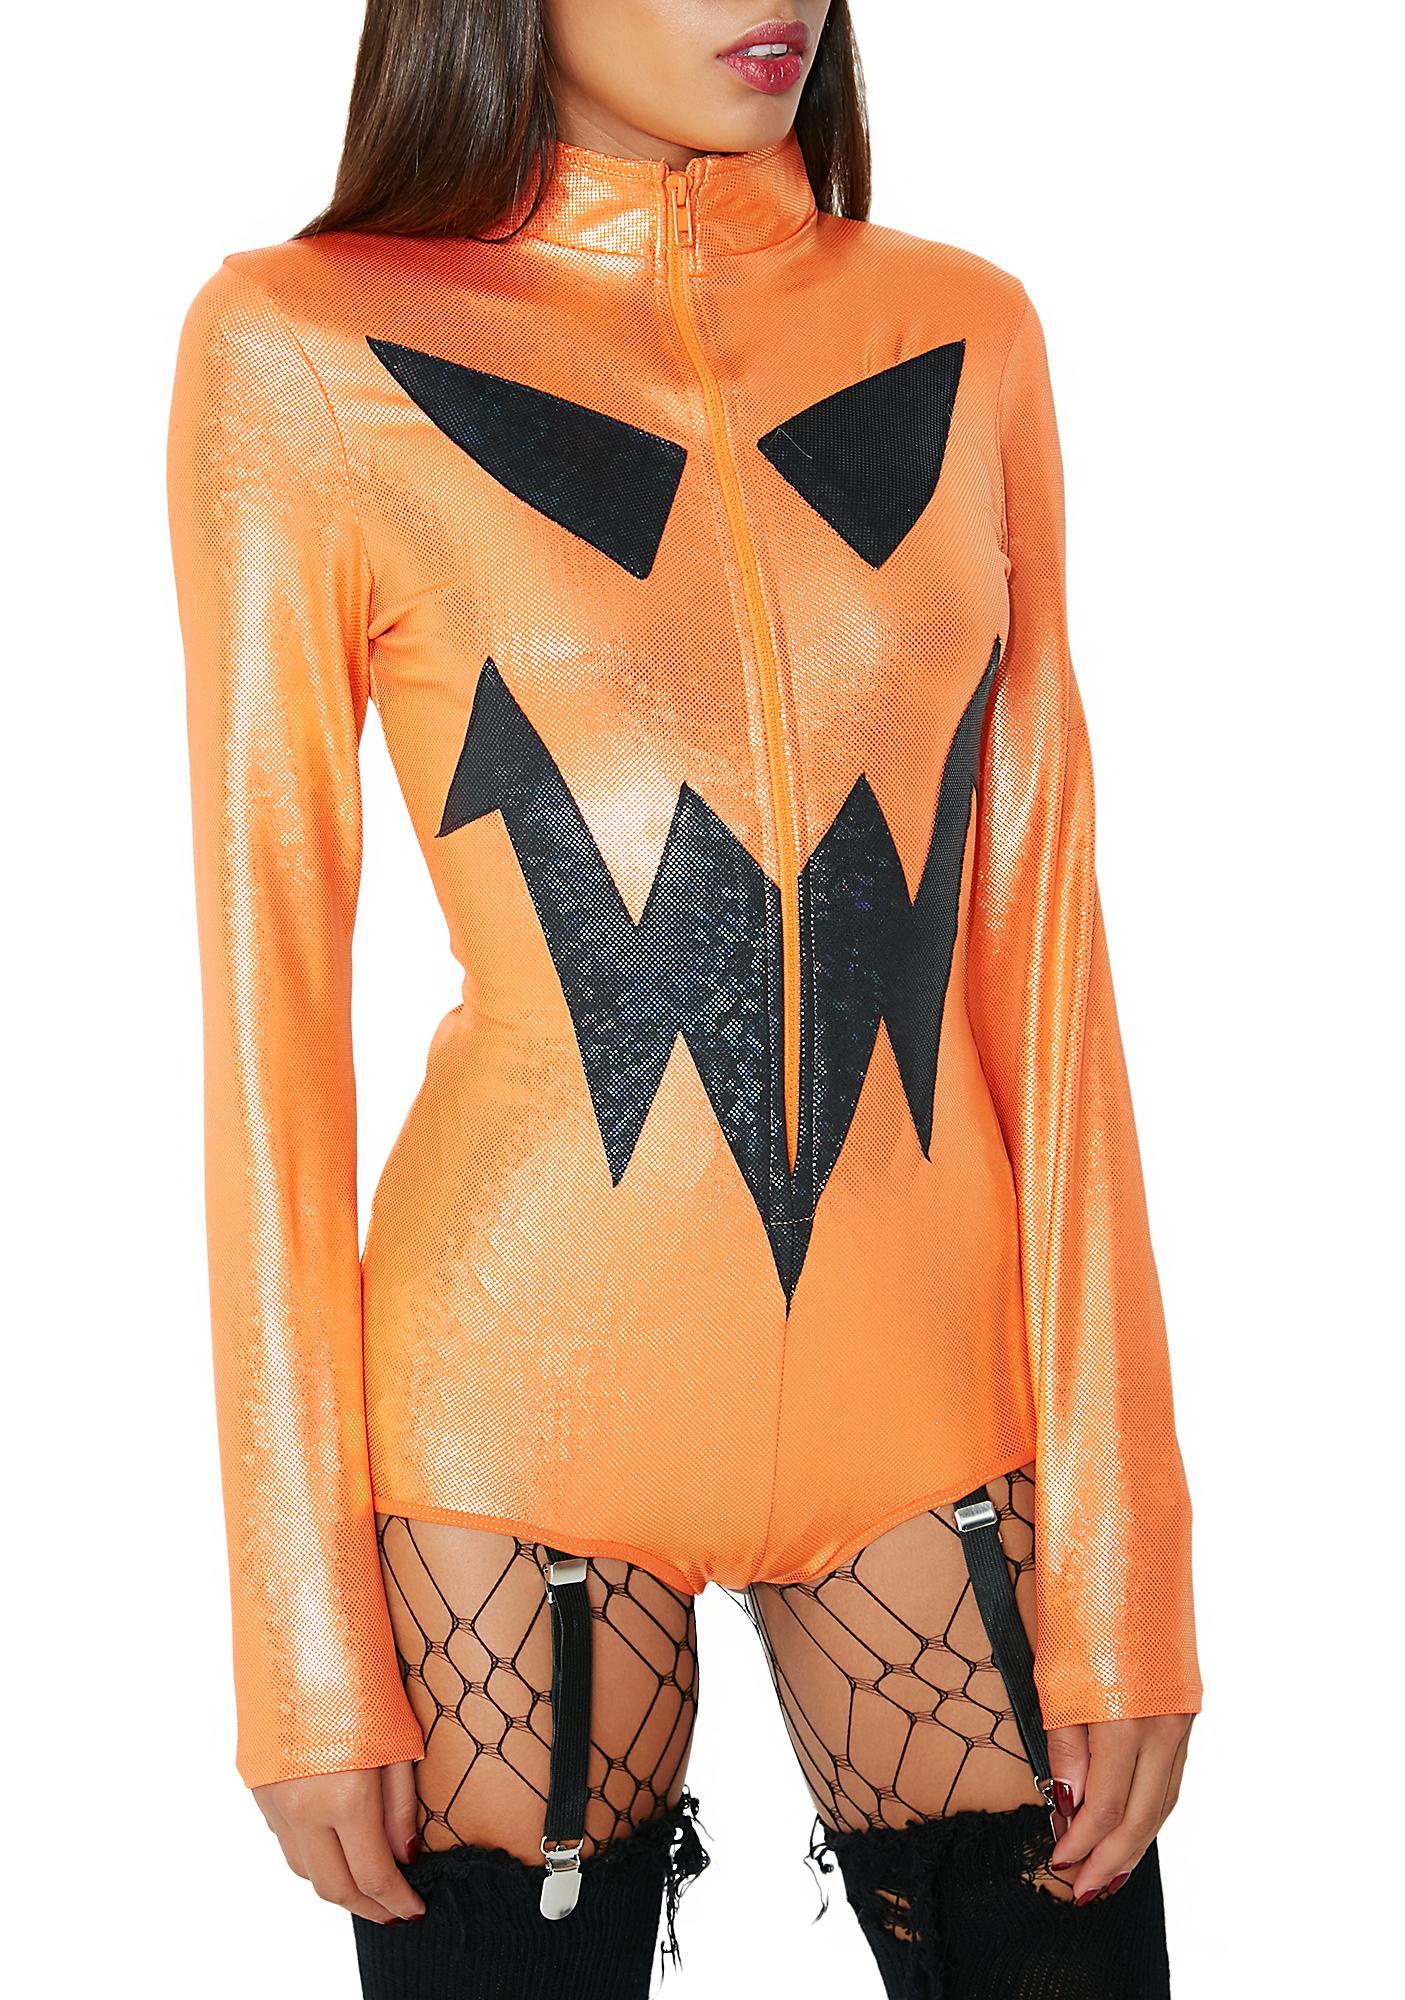 Jack-O-Lantern Iridescent Bodysuit